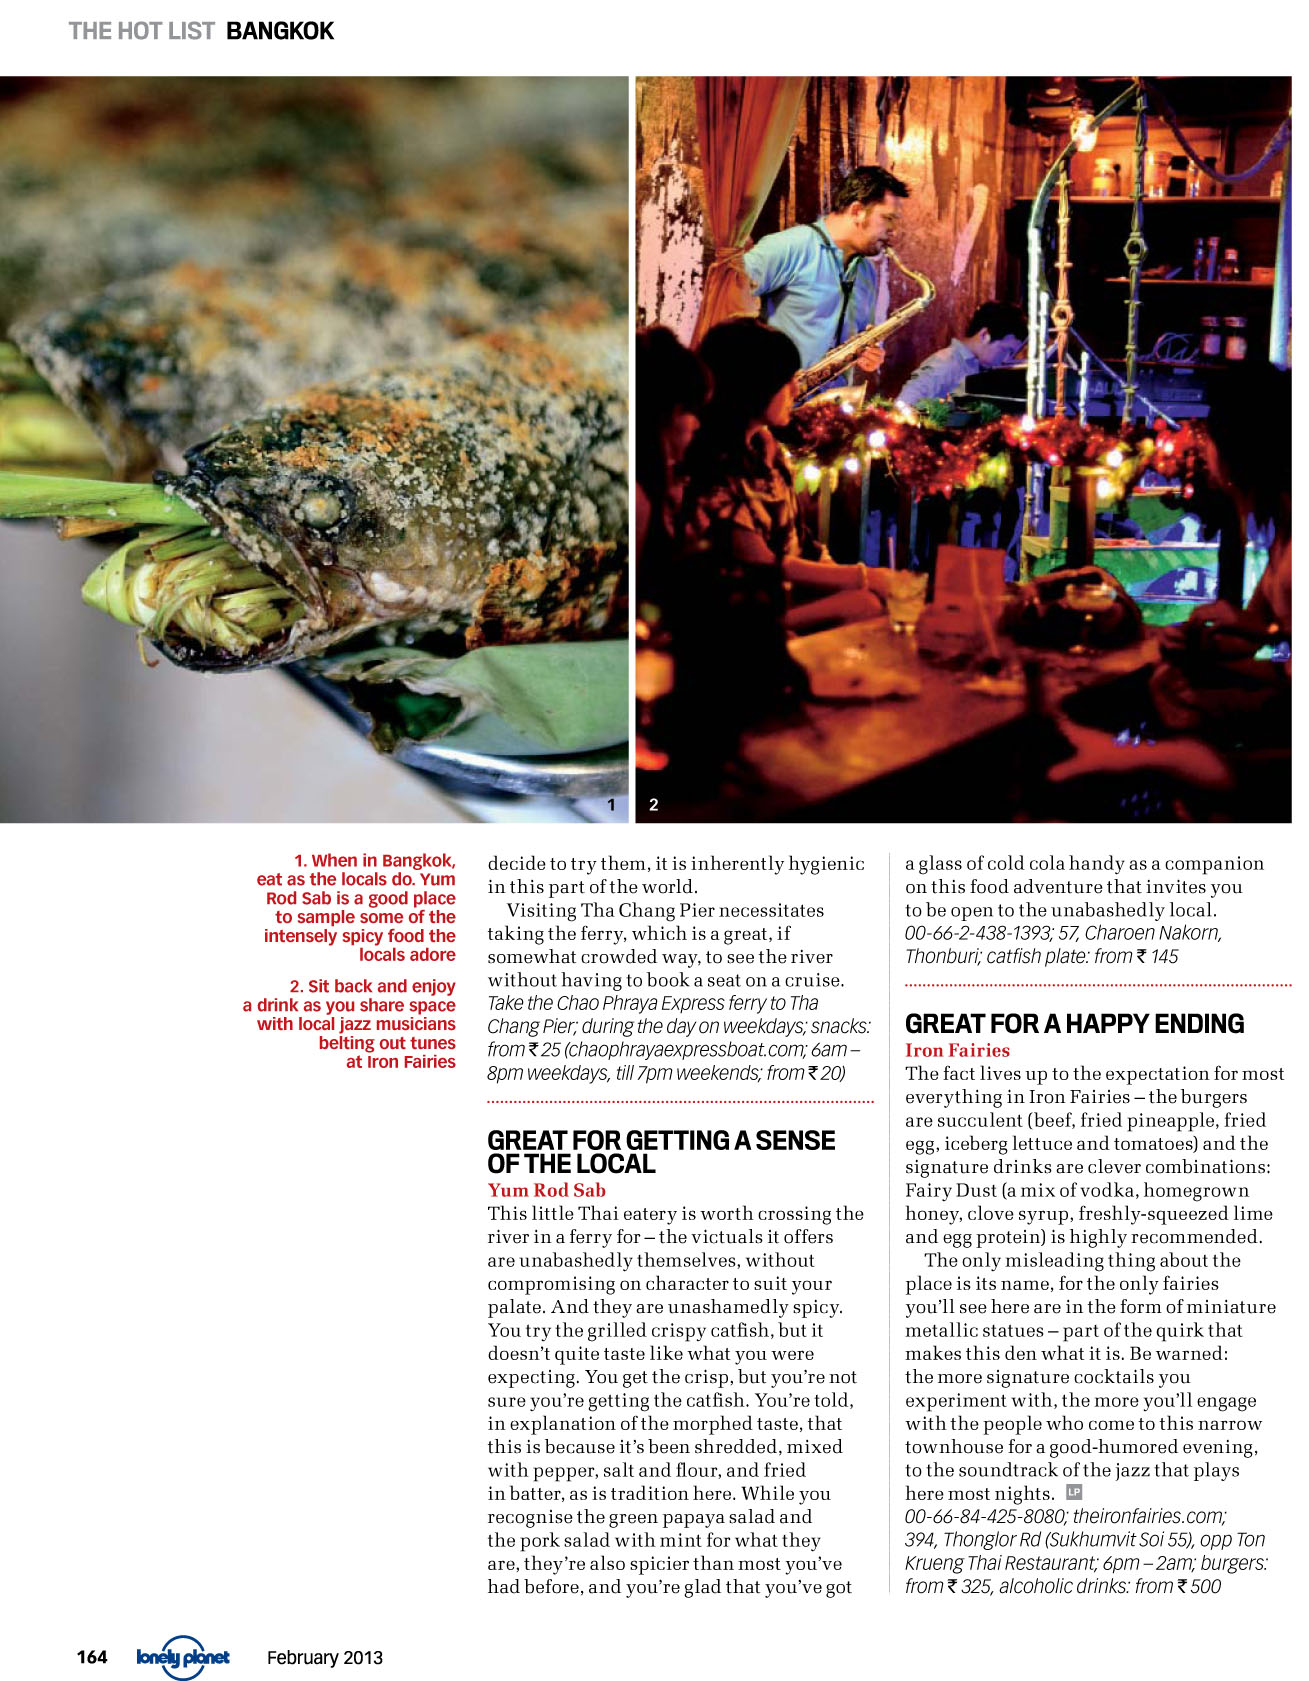 Lonely Planet Magazine India 2013-02-07.jpg